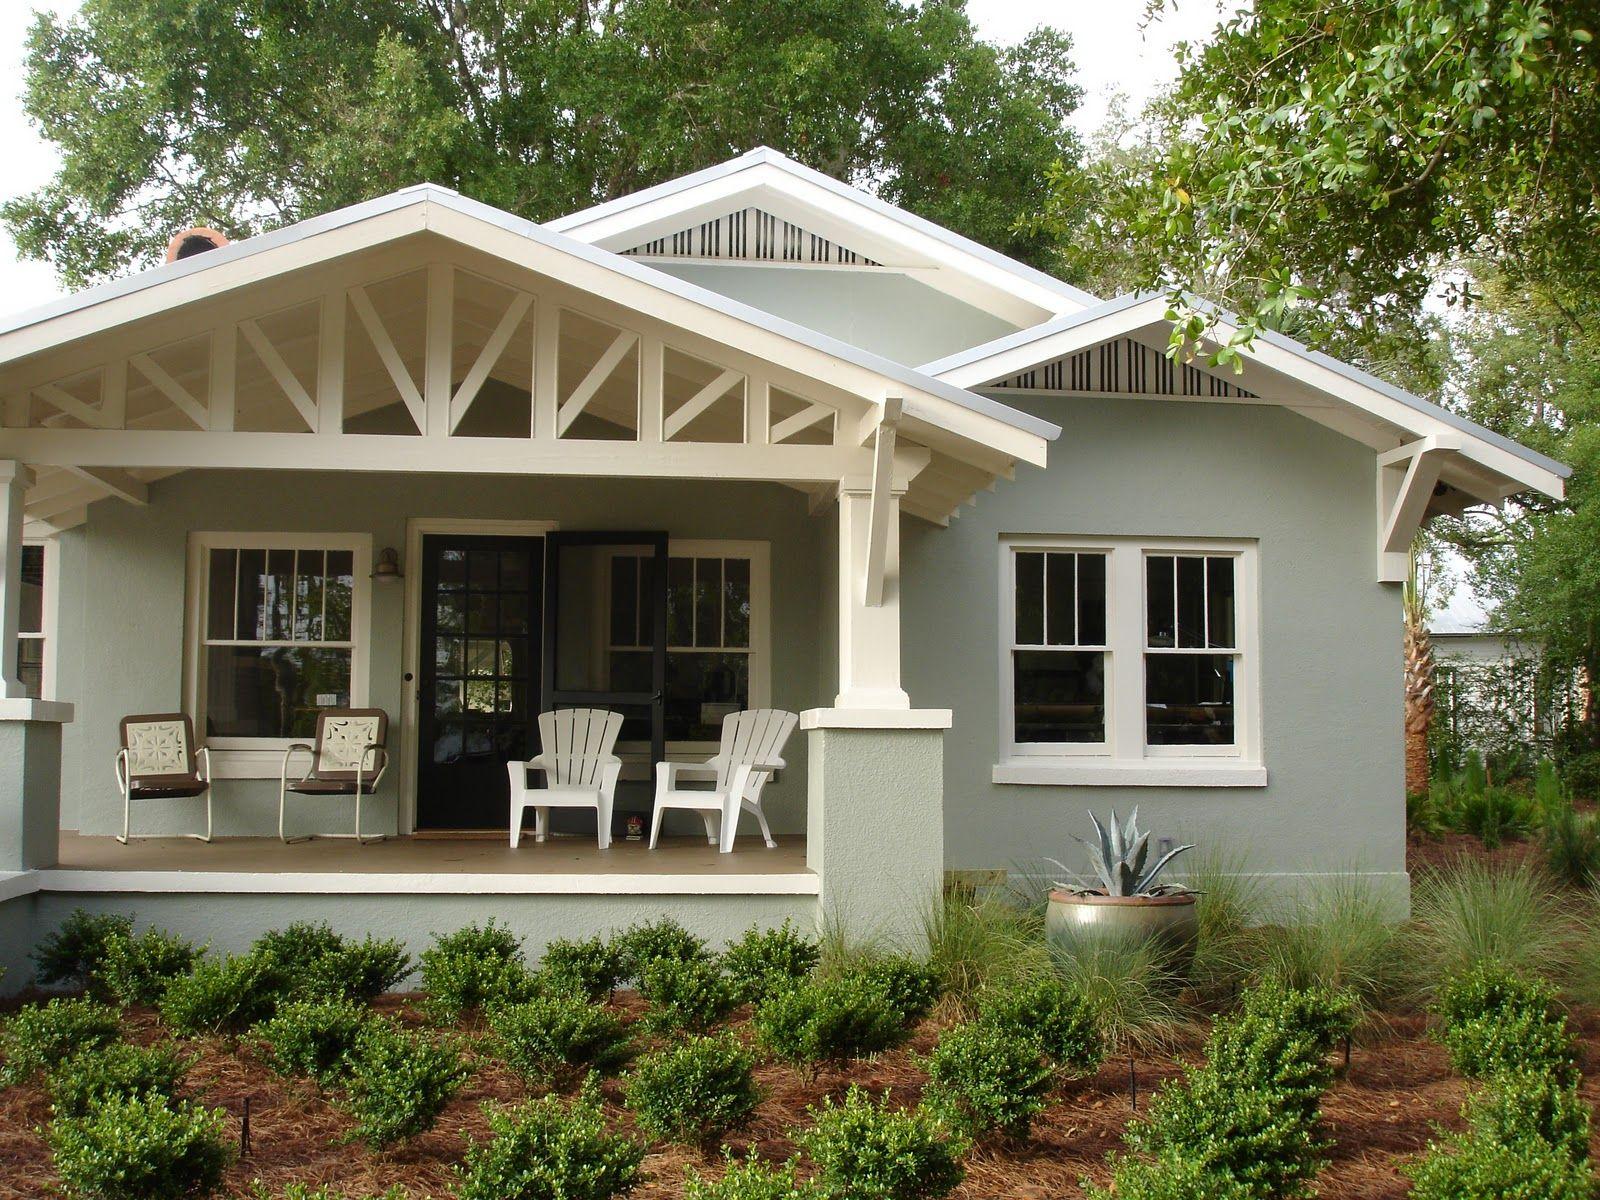 Bungalow House Philippines Design #homeworlddesign #interiordesign #interior  #interiors #house #home